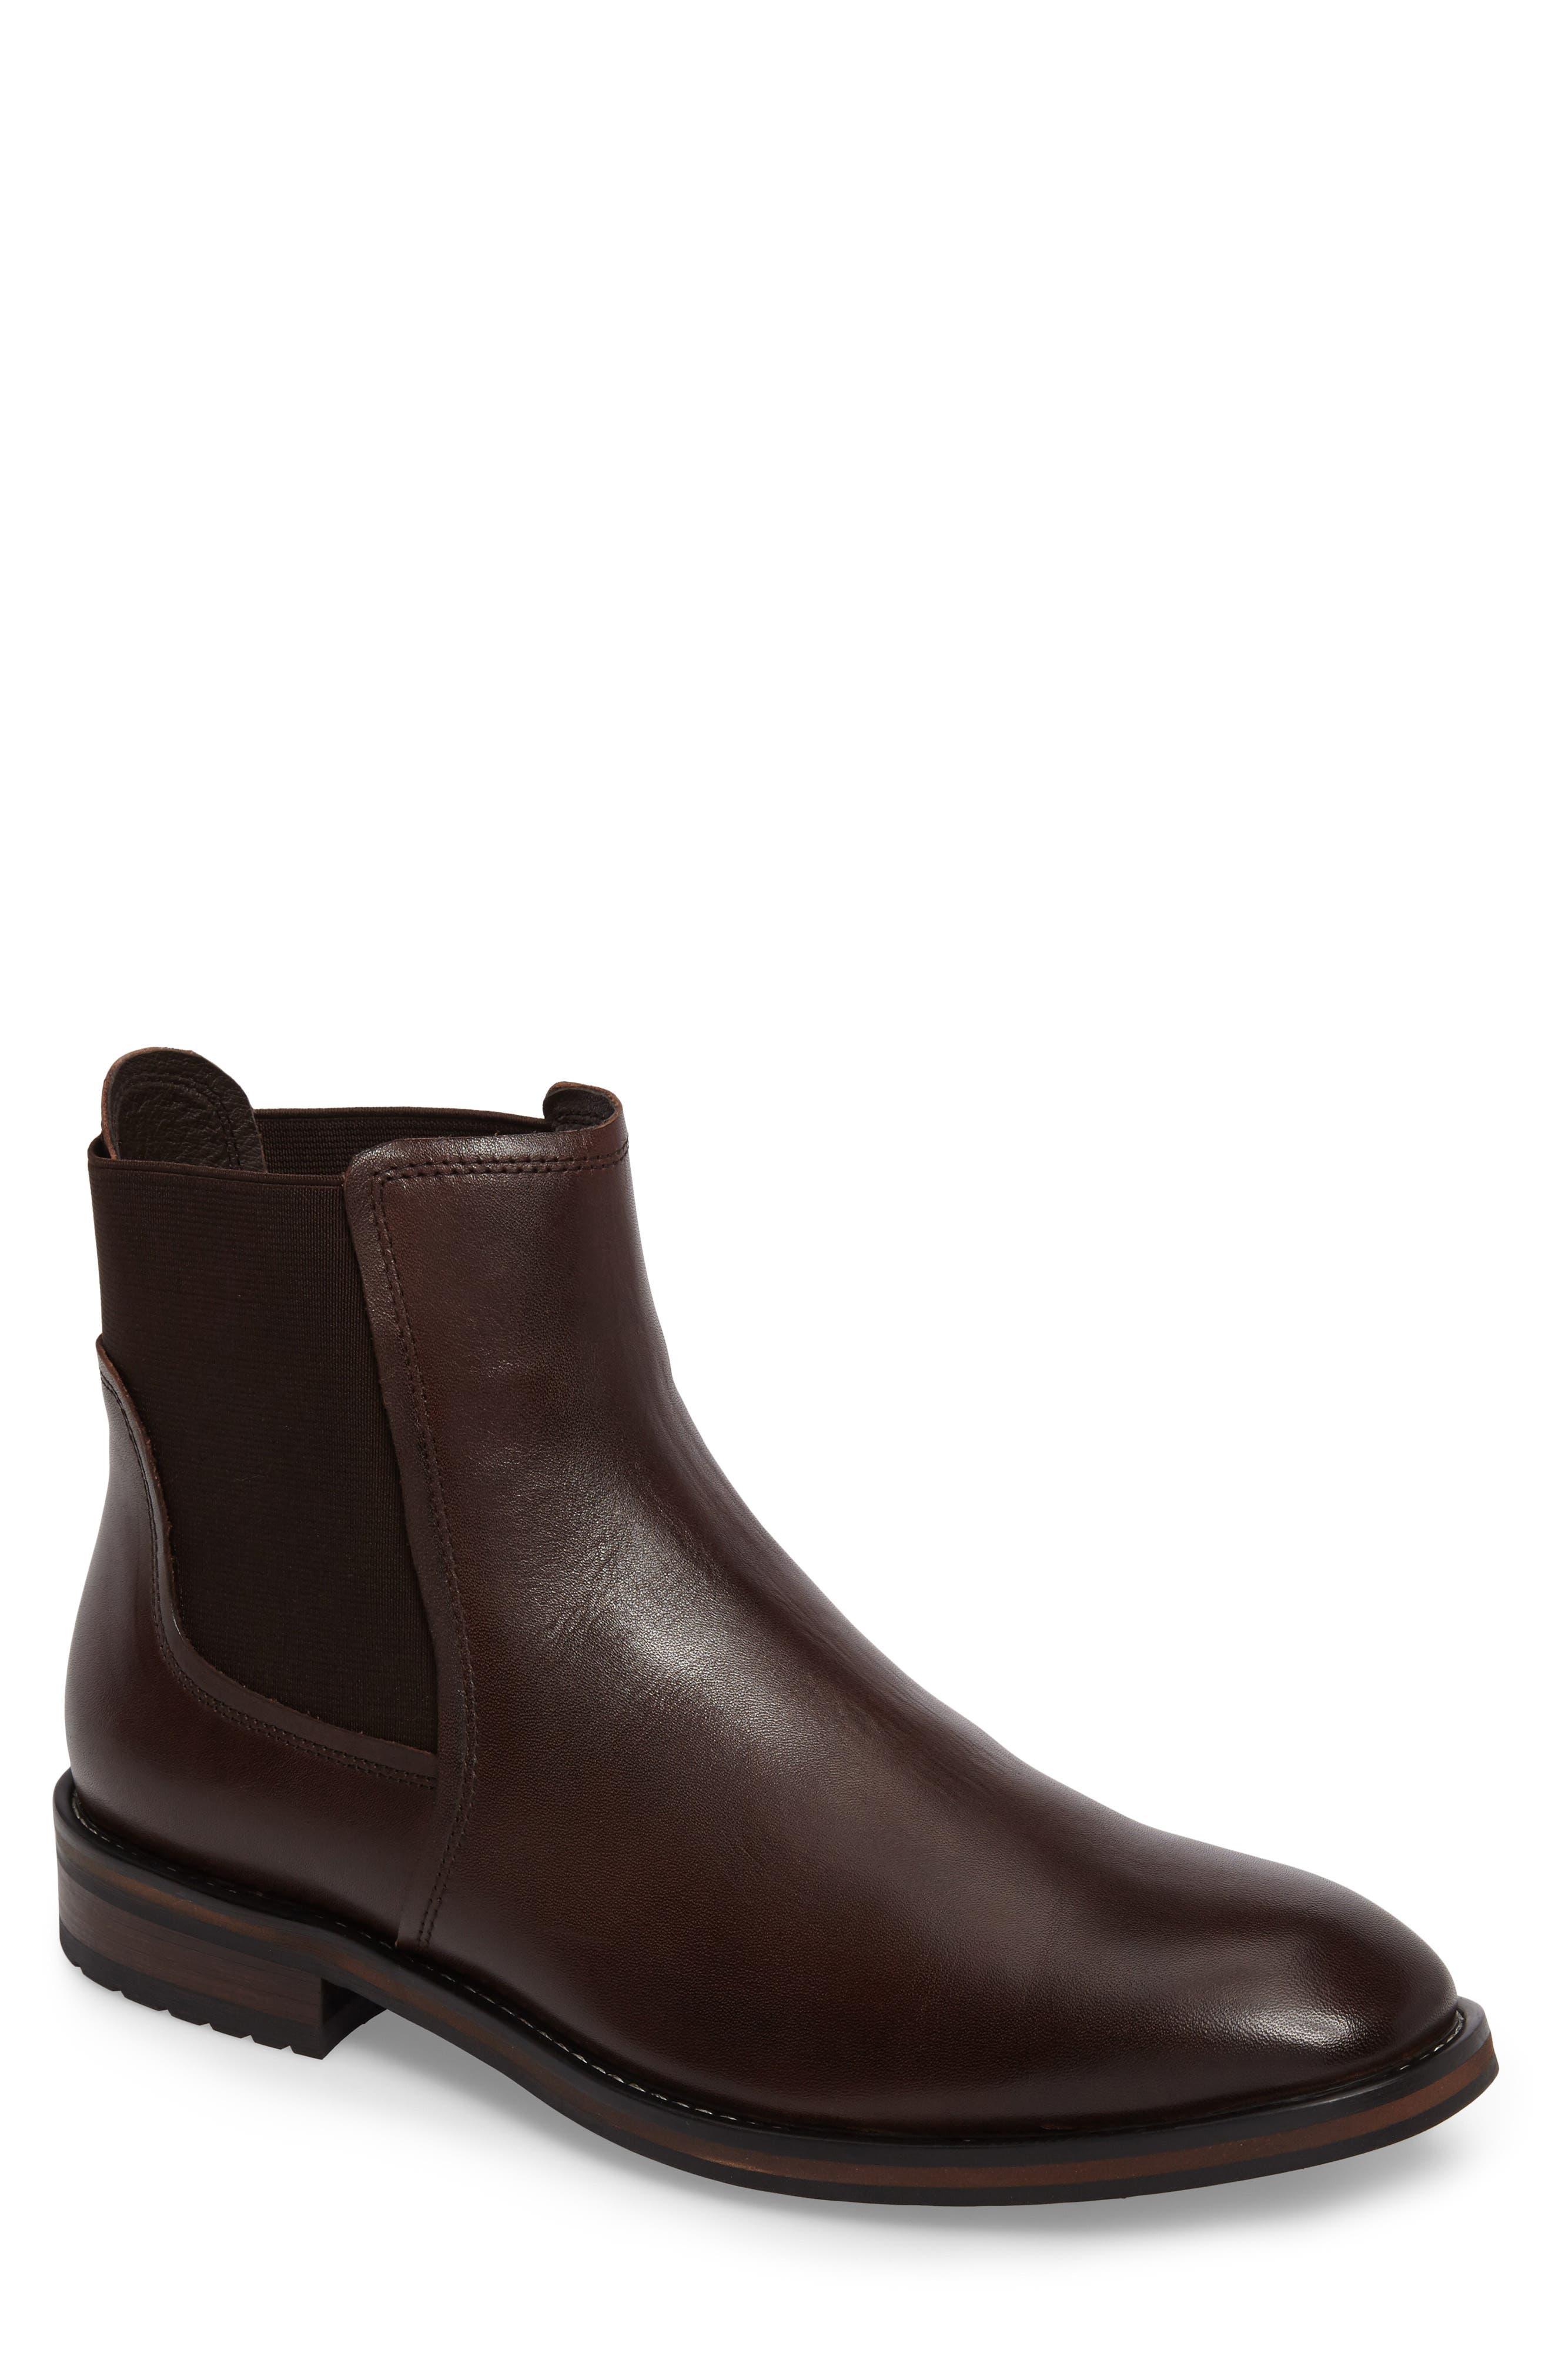 Main Image - English Laundry Belmont Chelsea Boot (Men)